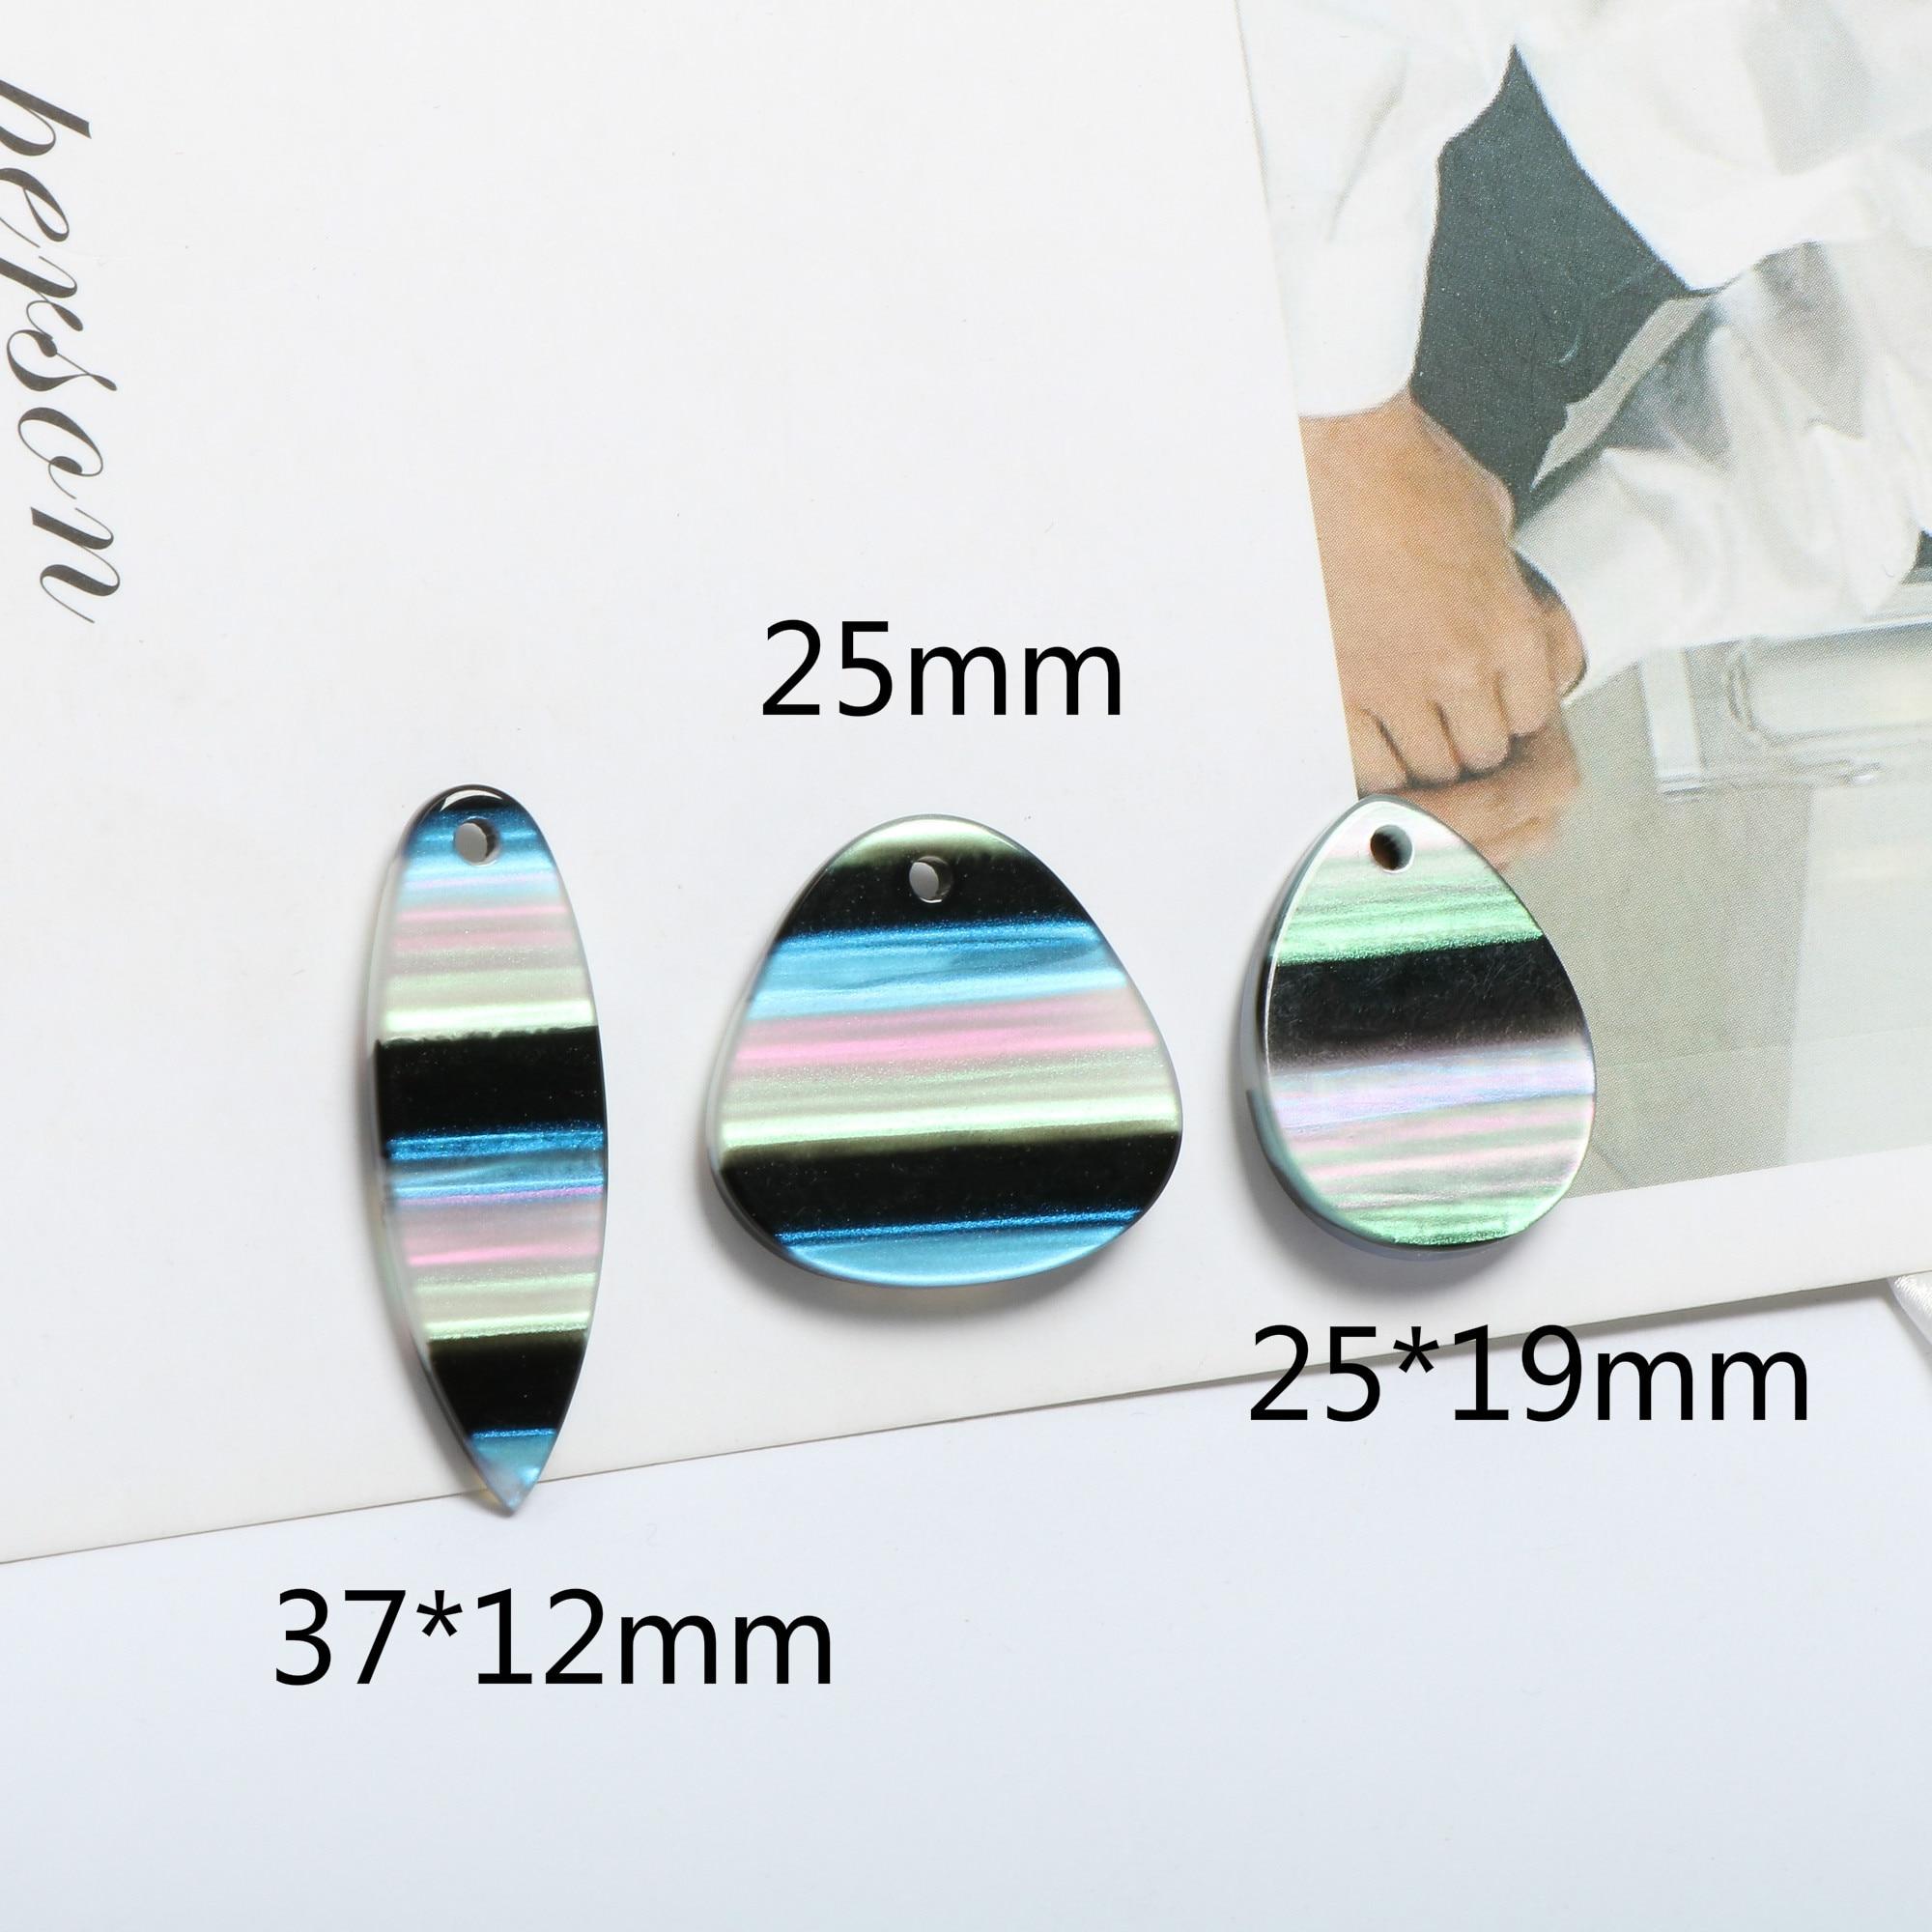 plate striped phantom color droplet leaf resin acetic acid pendant DIY handmade pendants jewelry Earrings Accessories Material in Jewelry Findings Components from Jewelry Accessories